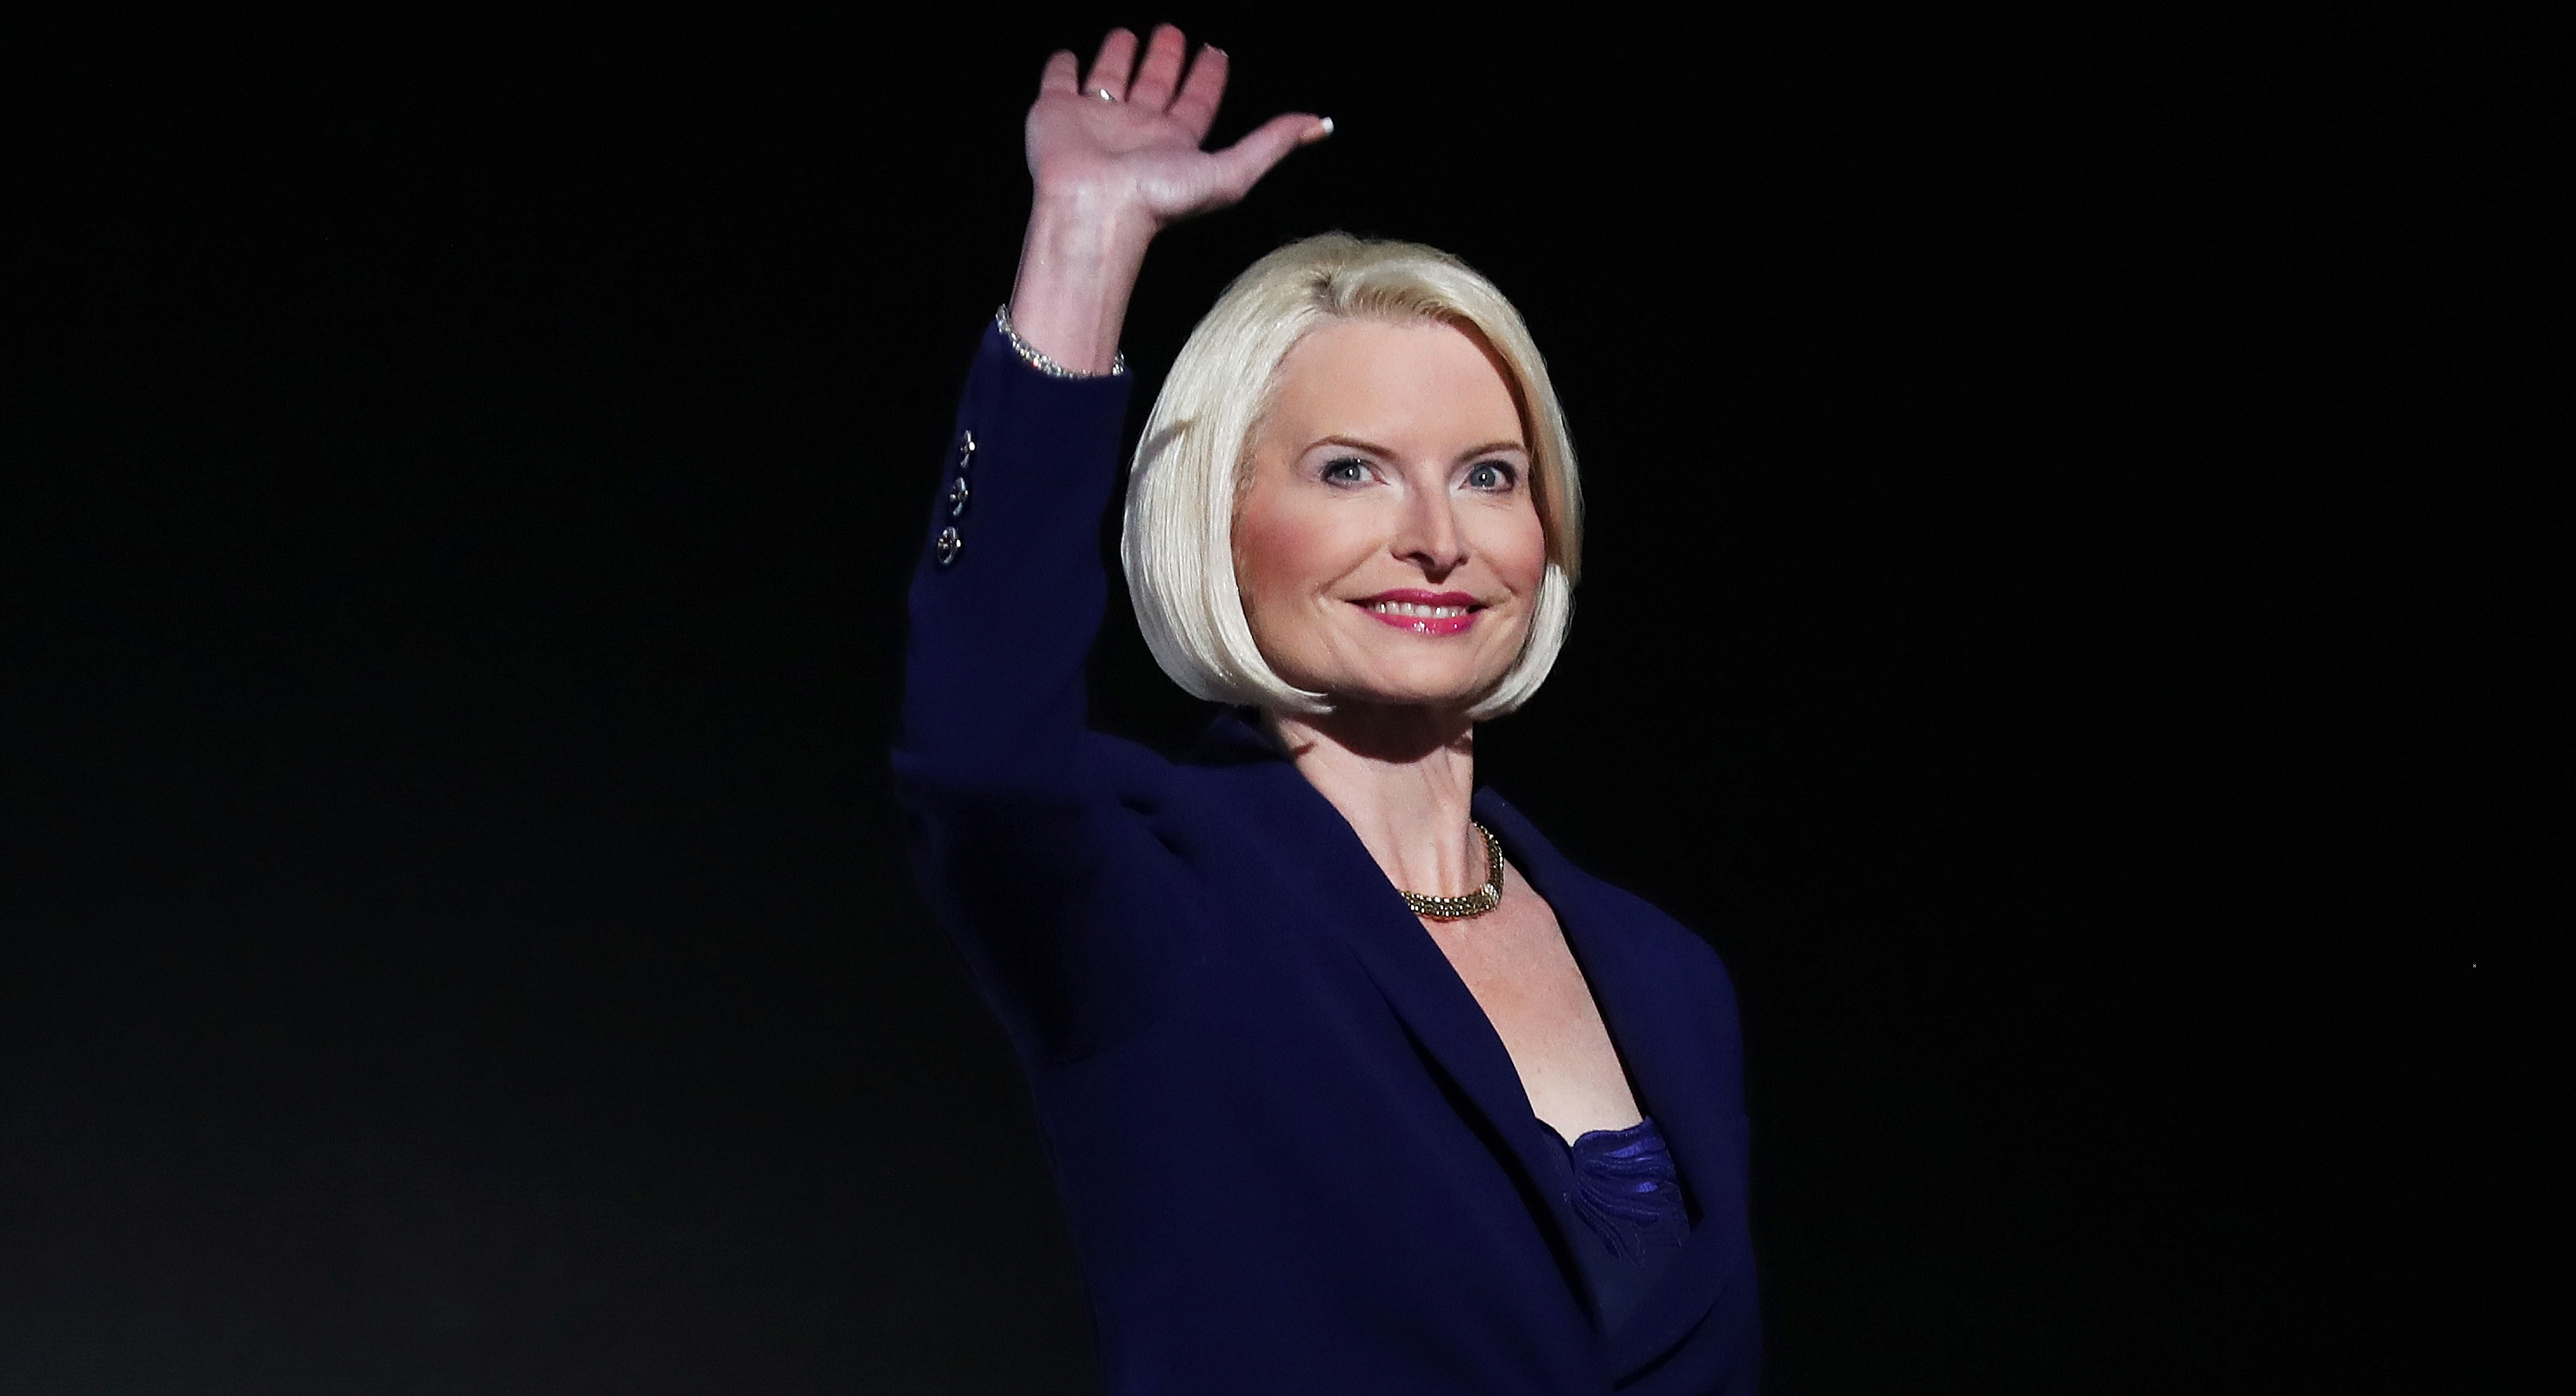 Trump To Nominate Callista Gingrich For Vatican